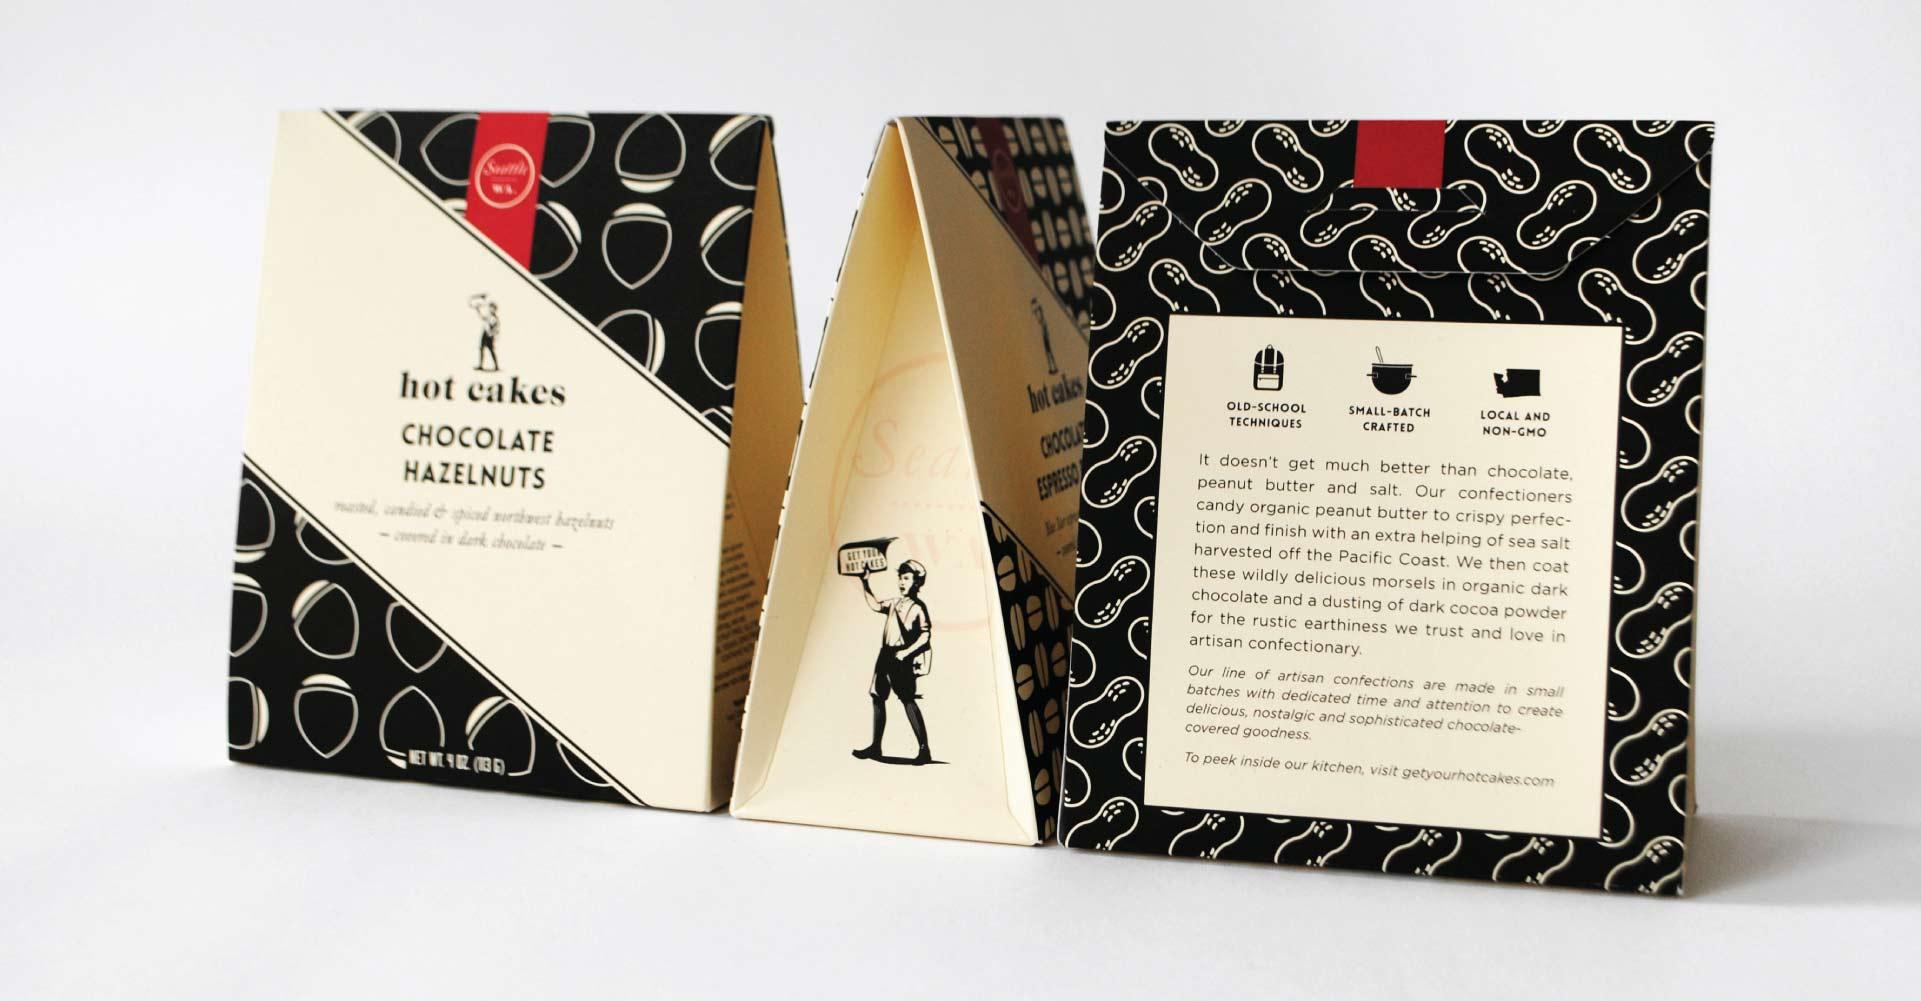 Creative_Retail_Packaging_Branding_Identity_Package_Design_HotCakes_12.jpg